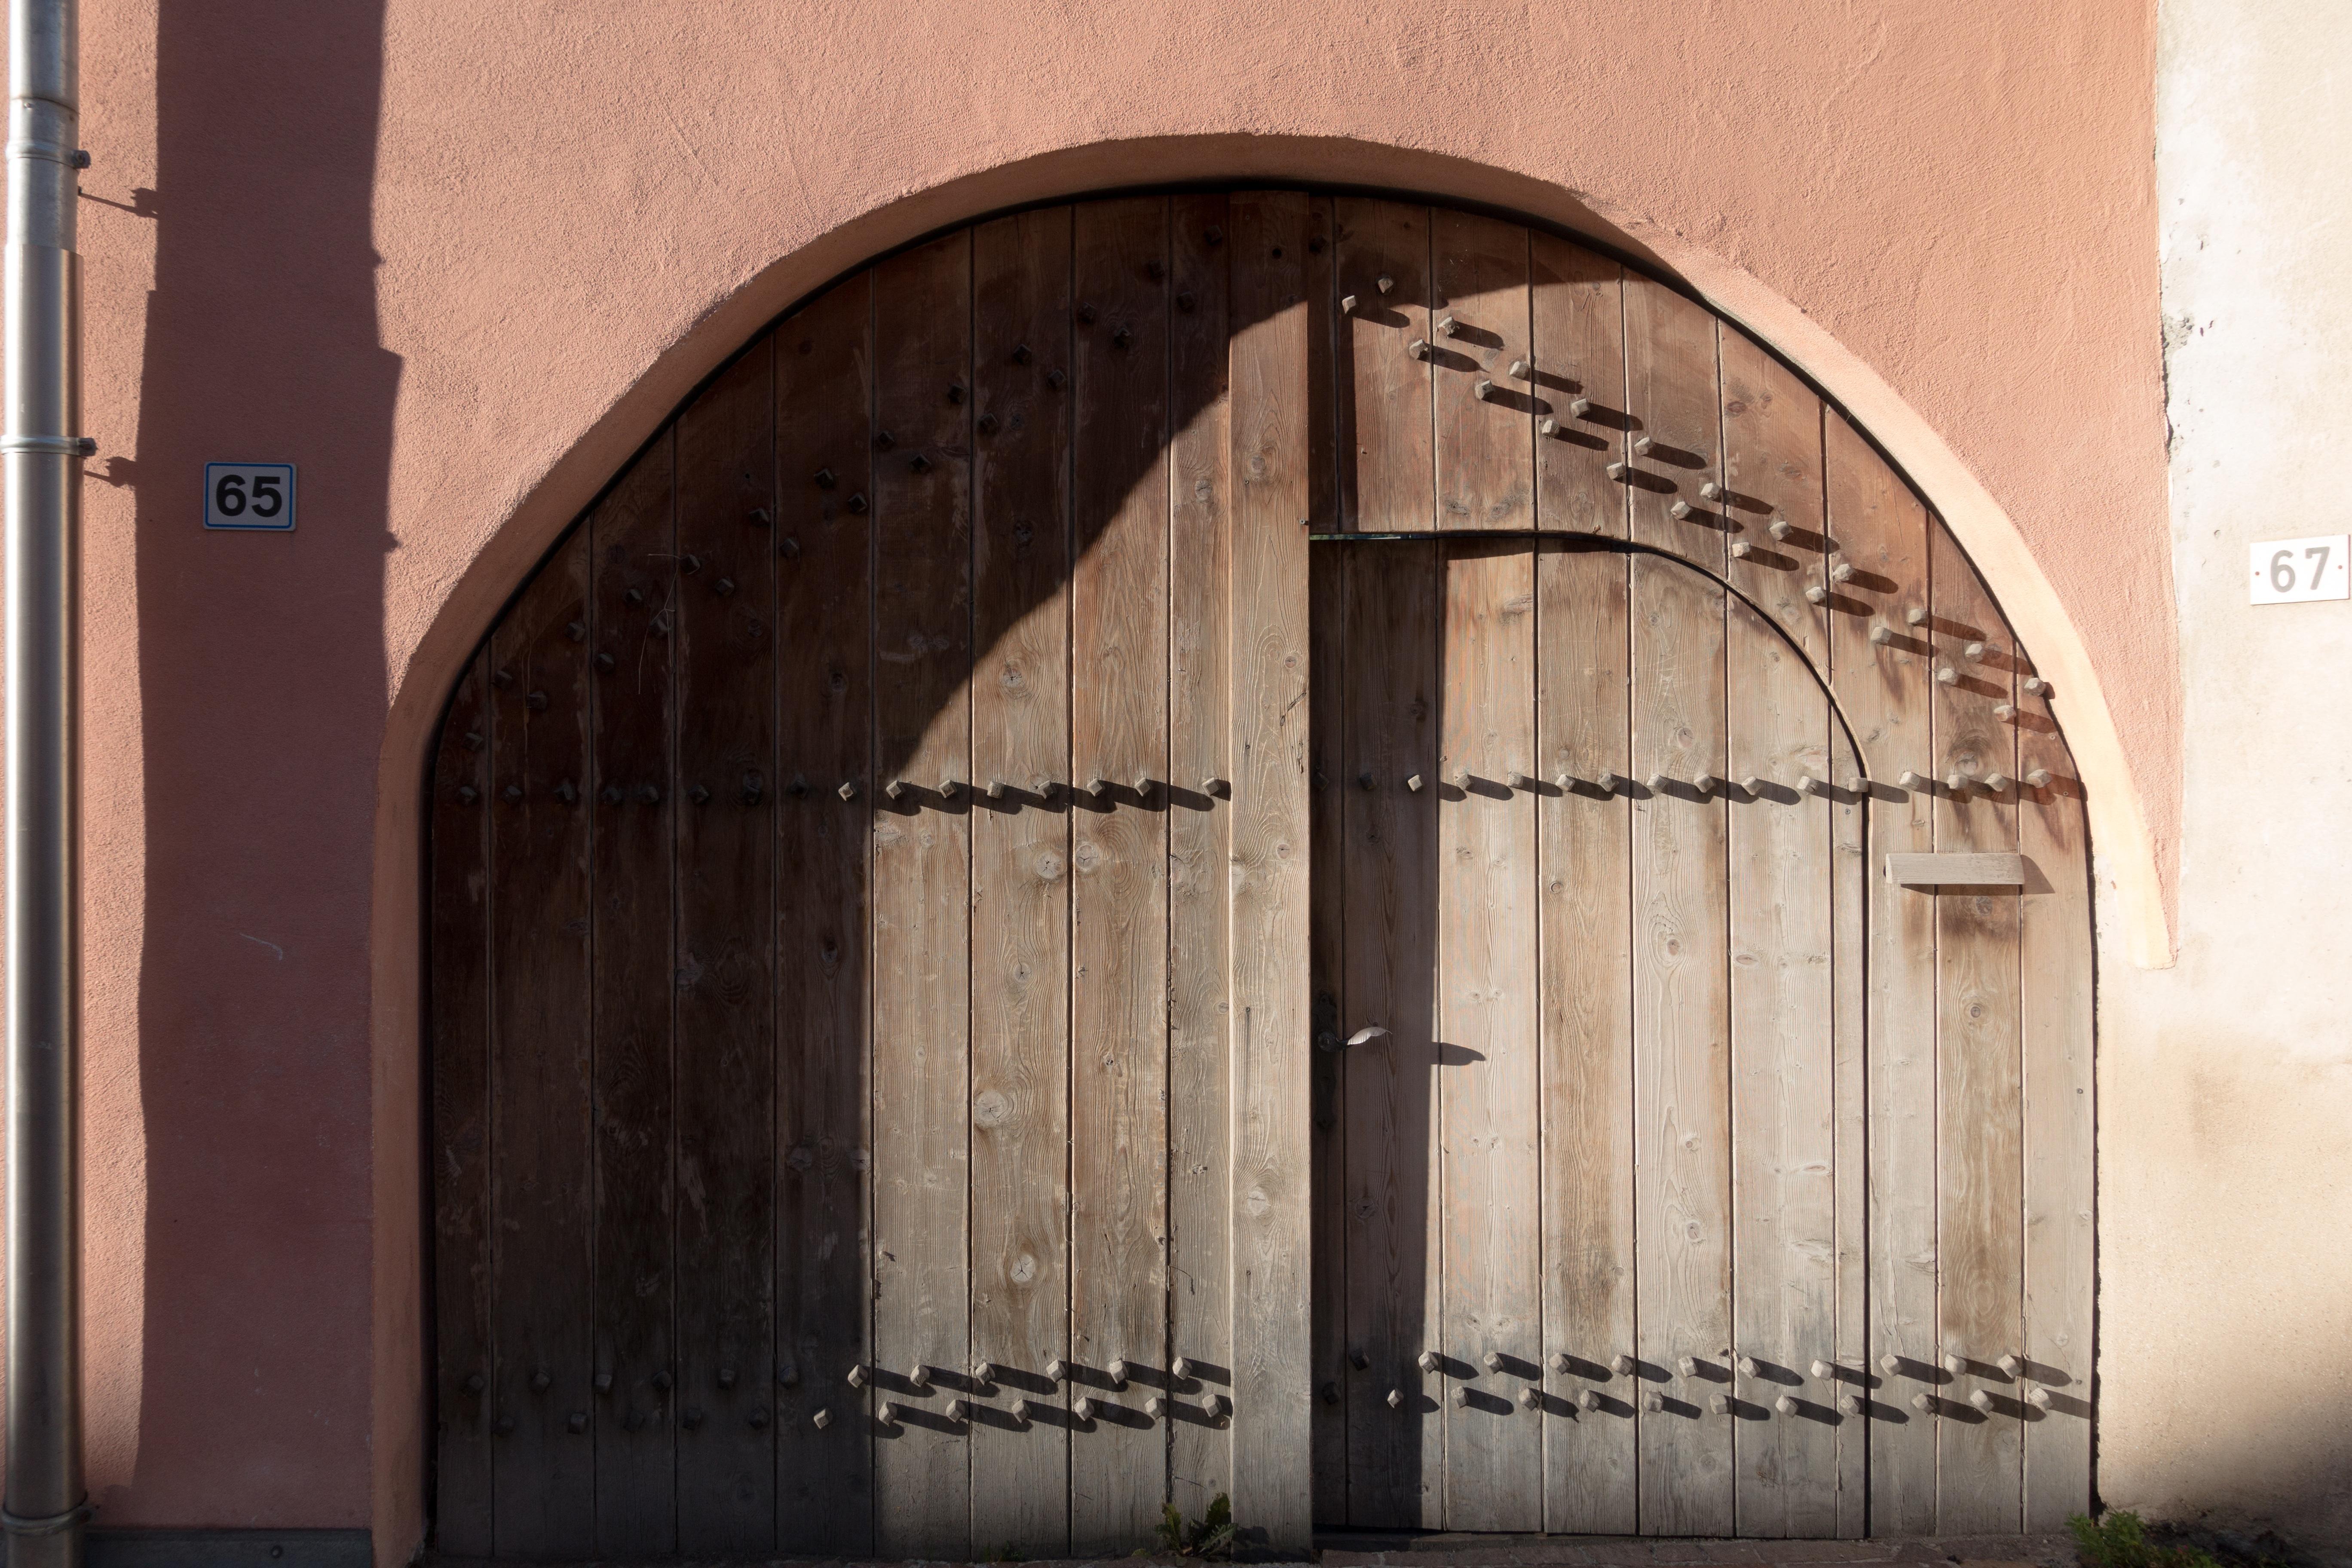 Fotos gratis arquitectura madera ventana edificio - Arcos de madera para puertas ...